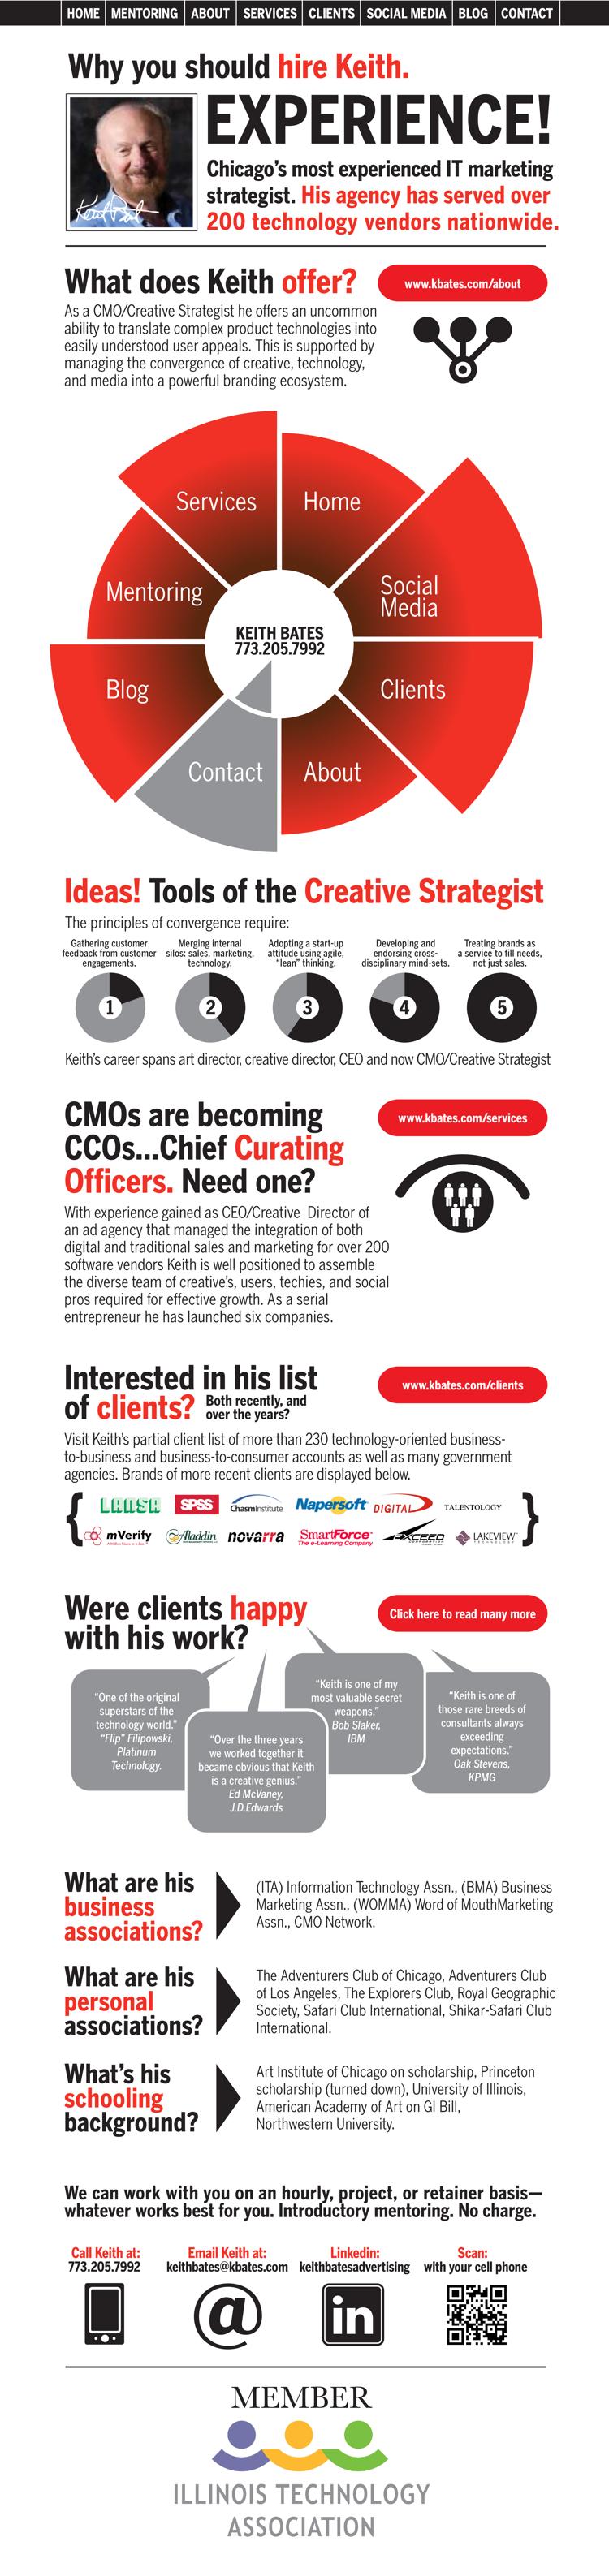 Keith Bates Infographic Resume